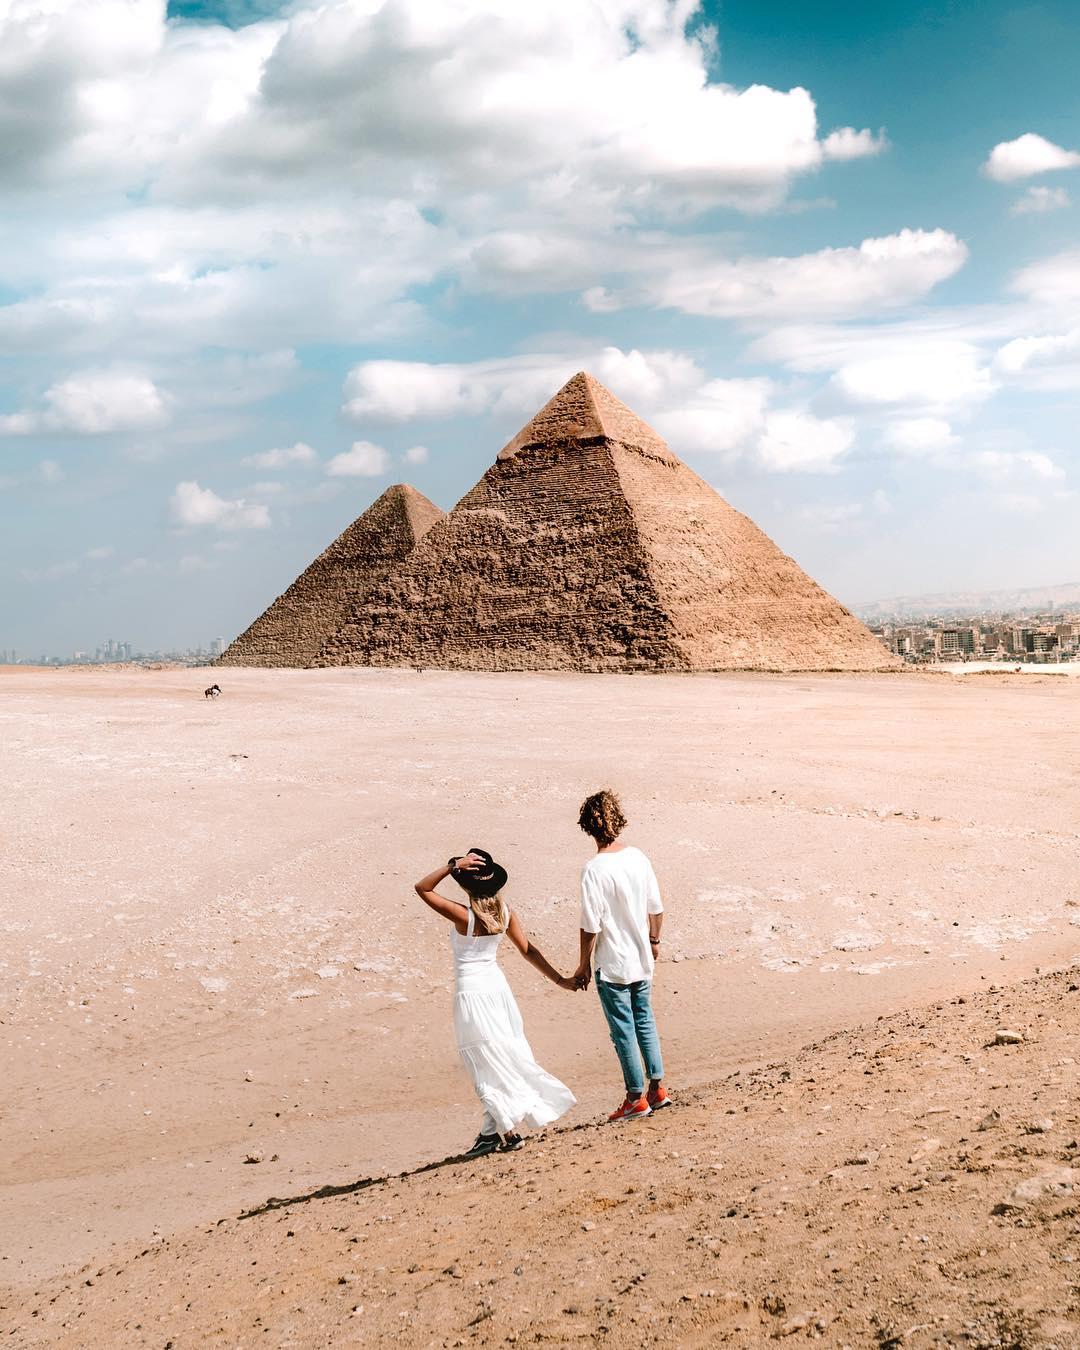 Egypt Pyramids Salt in our Hair